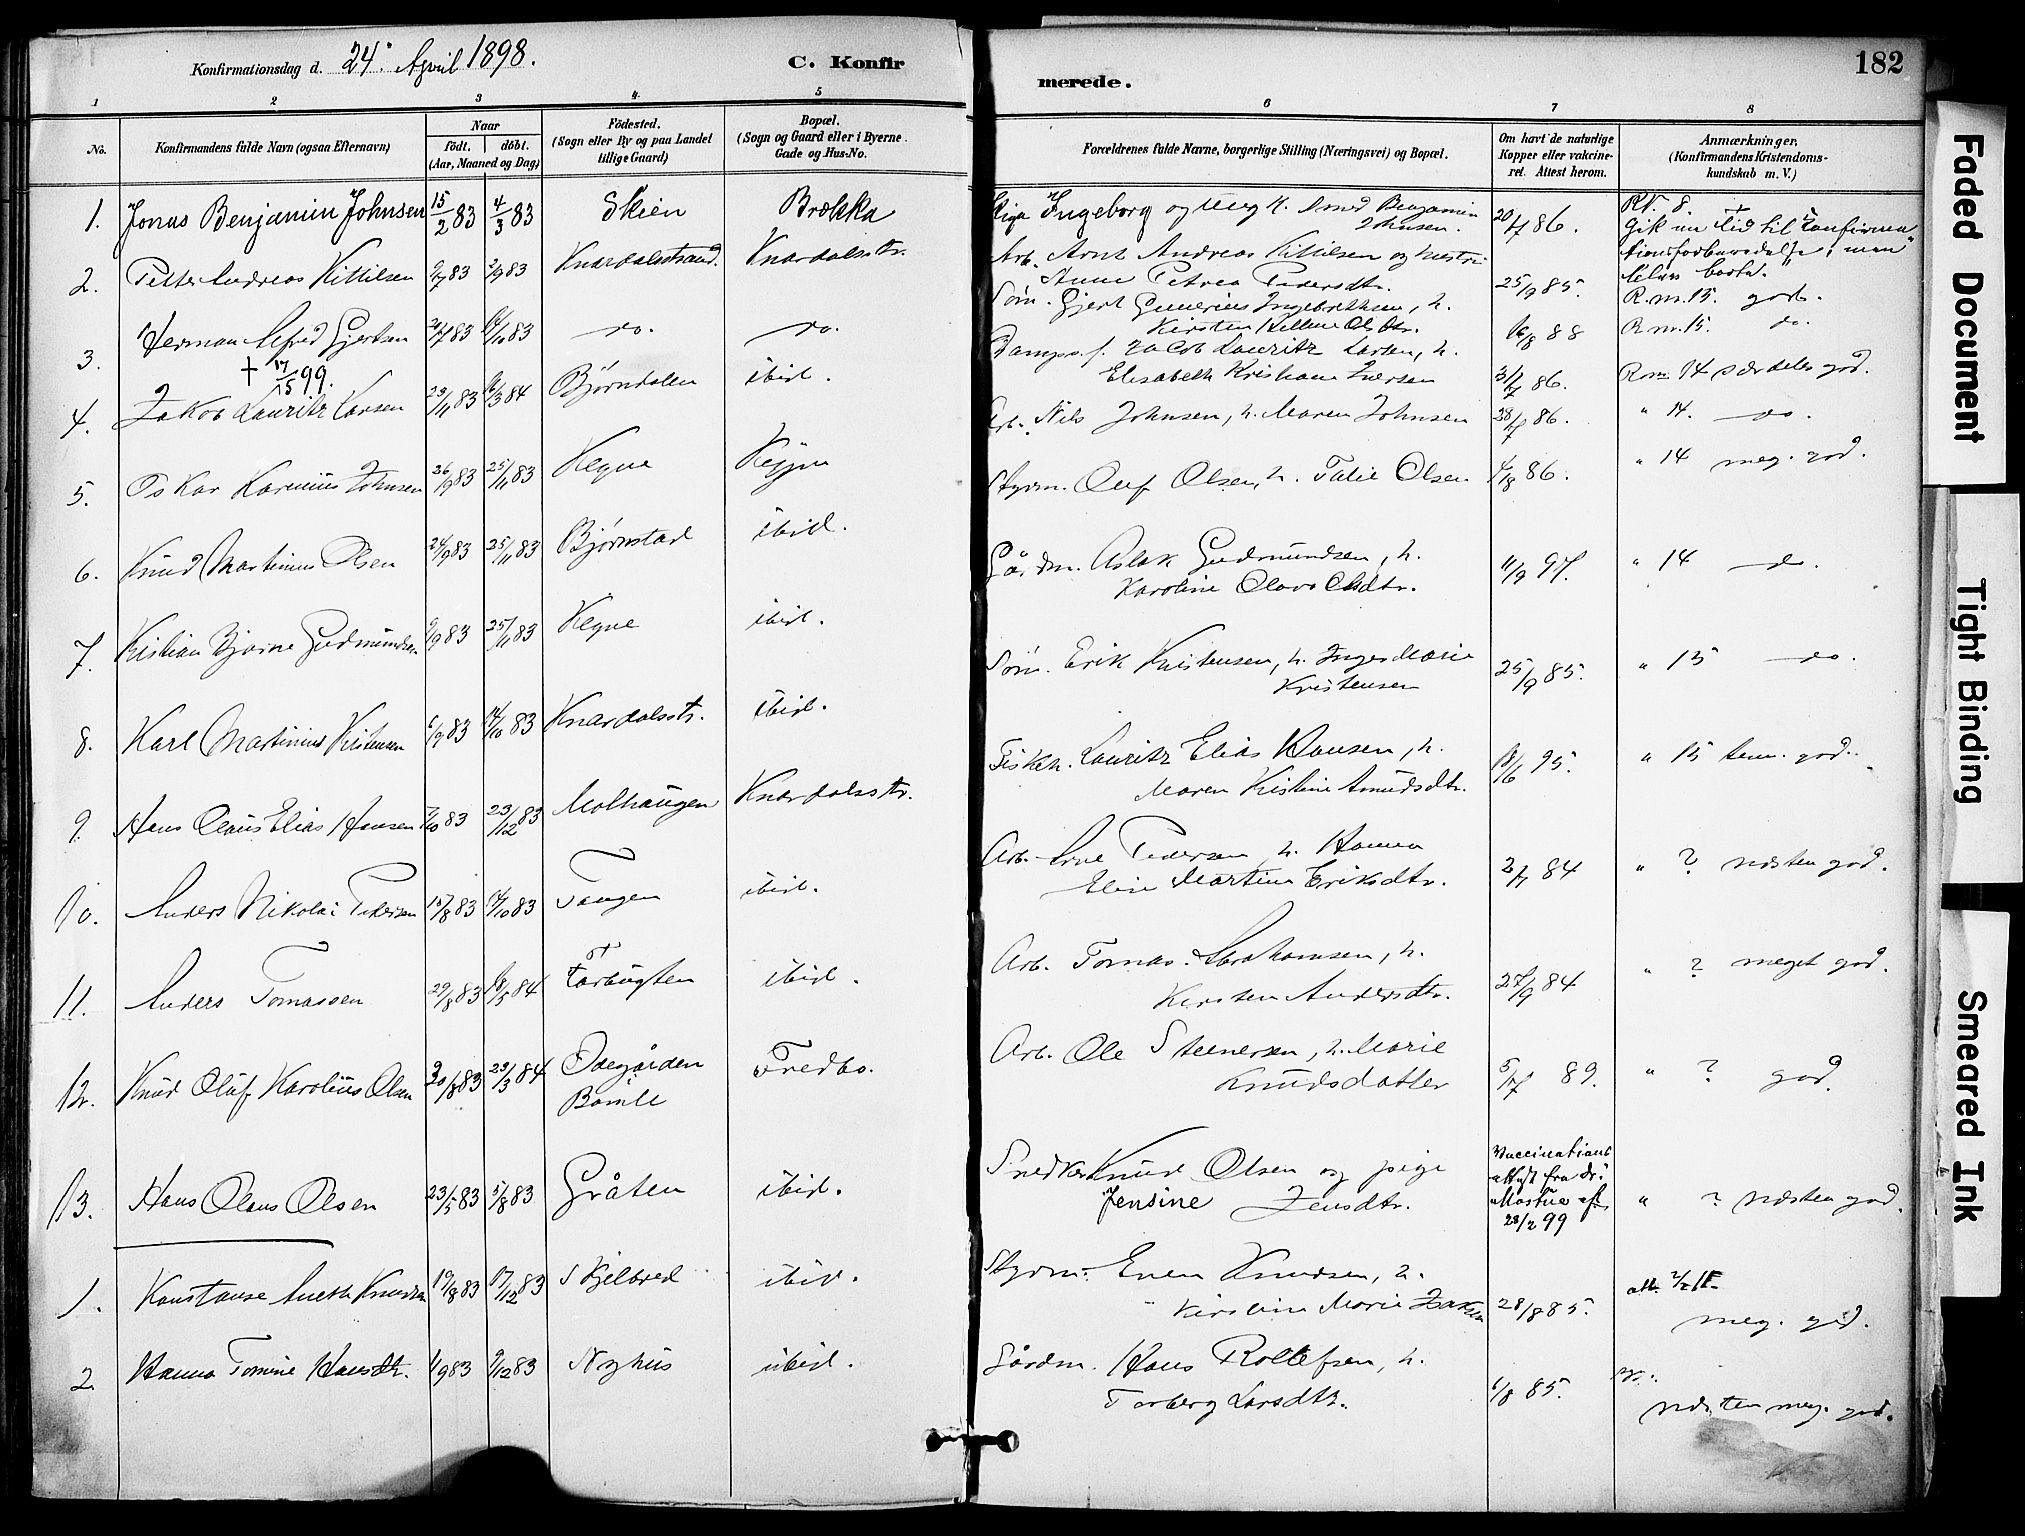 SAKO, Solum kirkebøker, F/Fa/L0010: Ministerialbok nr. I 10, 1888-1898, s. 182